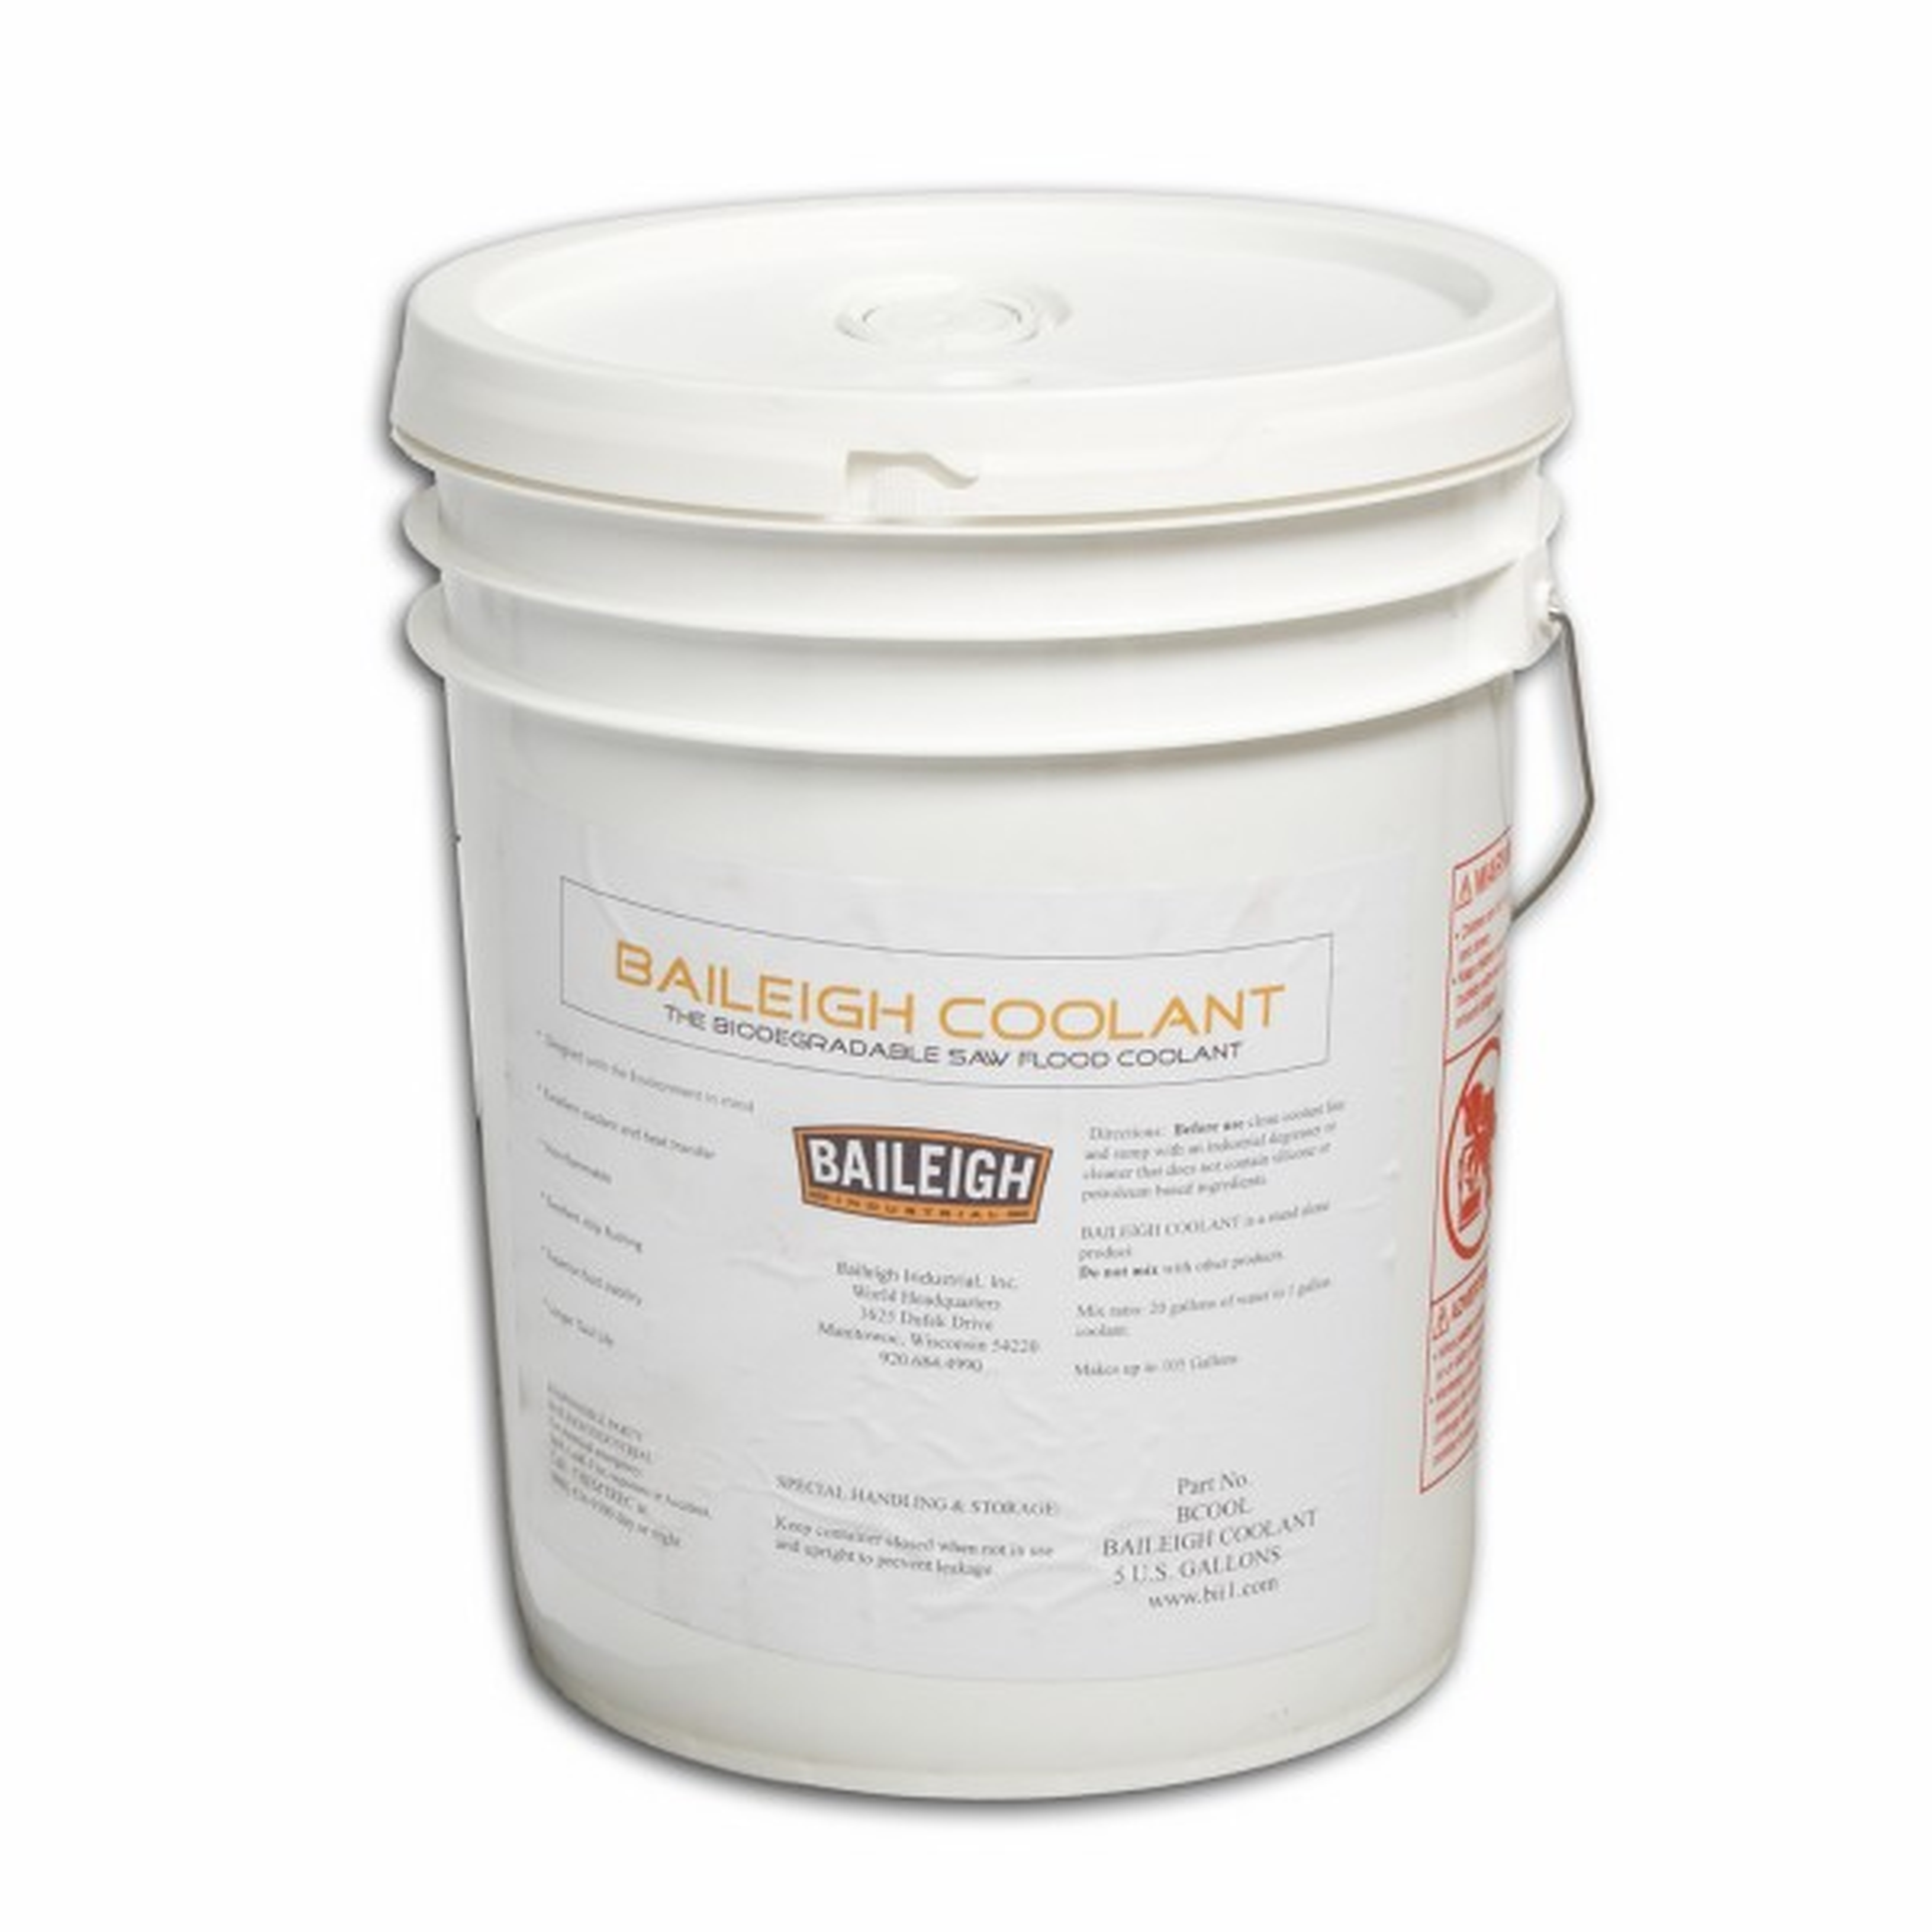 5 Gallon Baileigh Saw Coolant